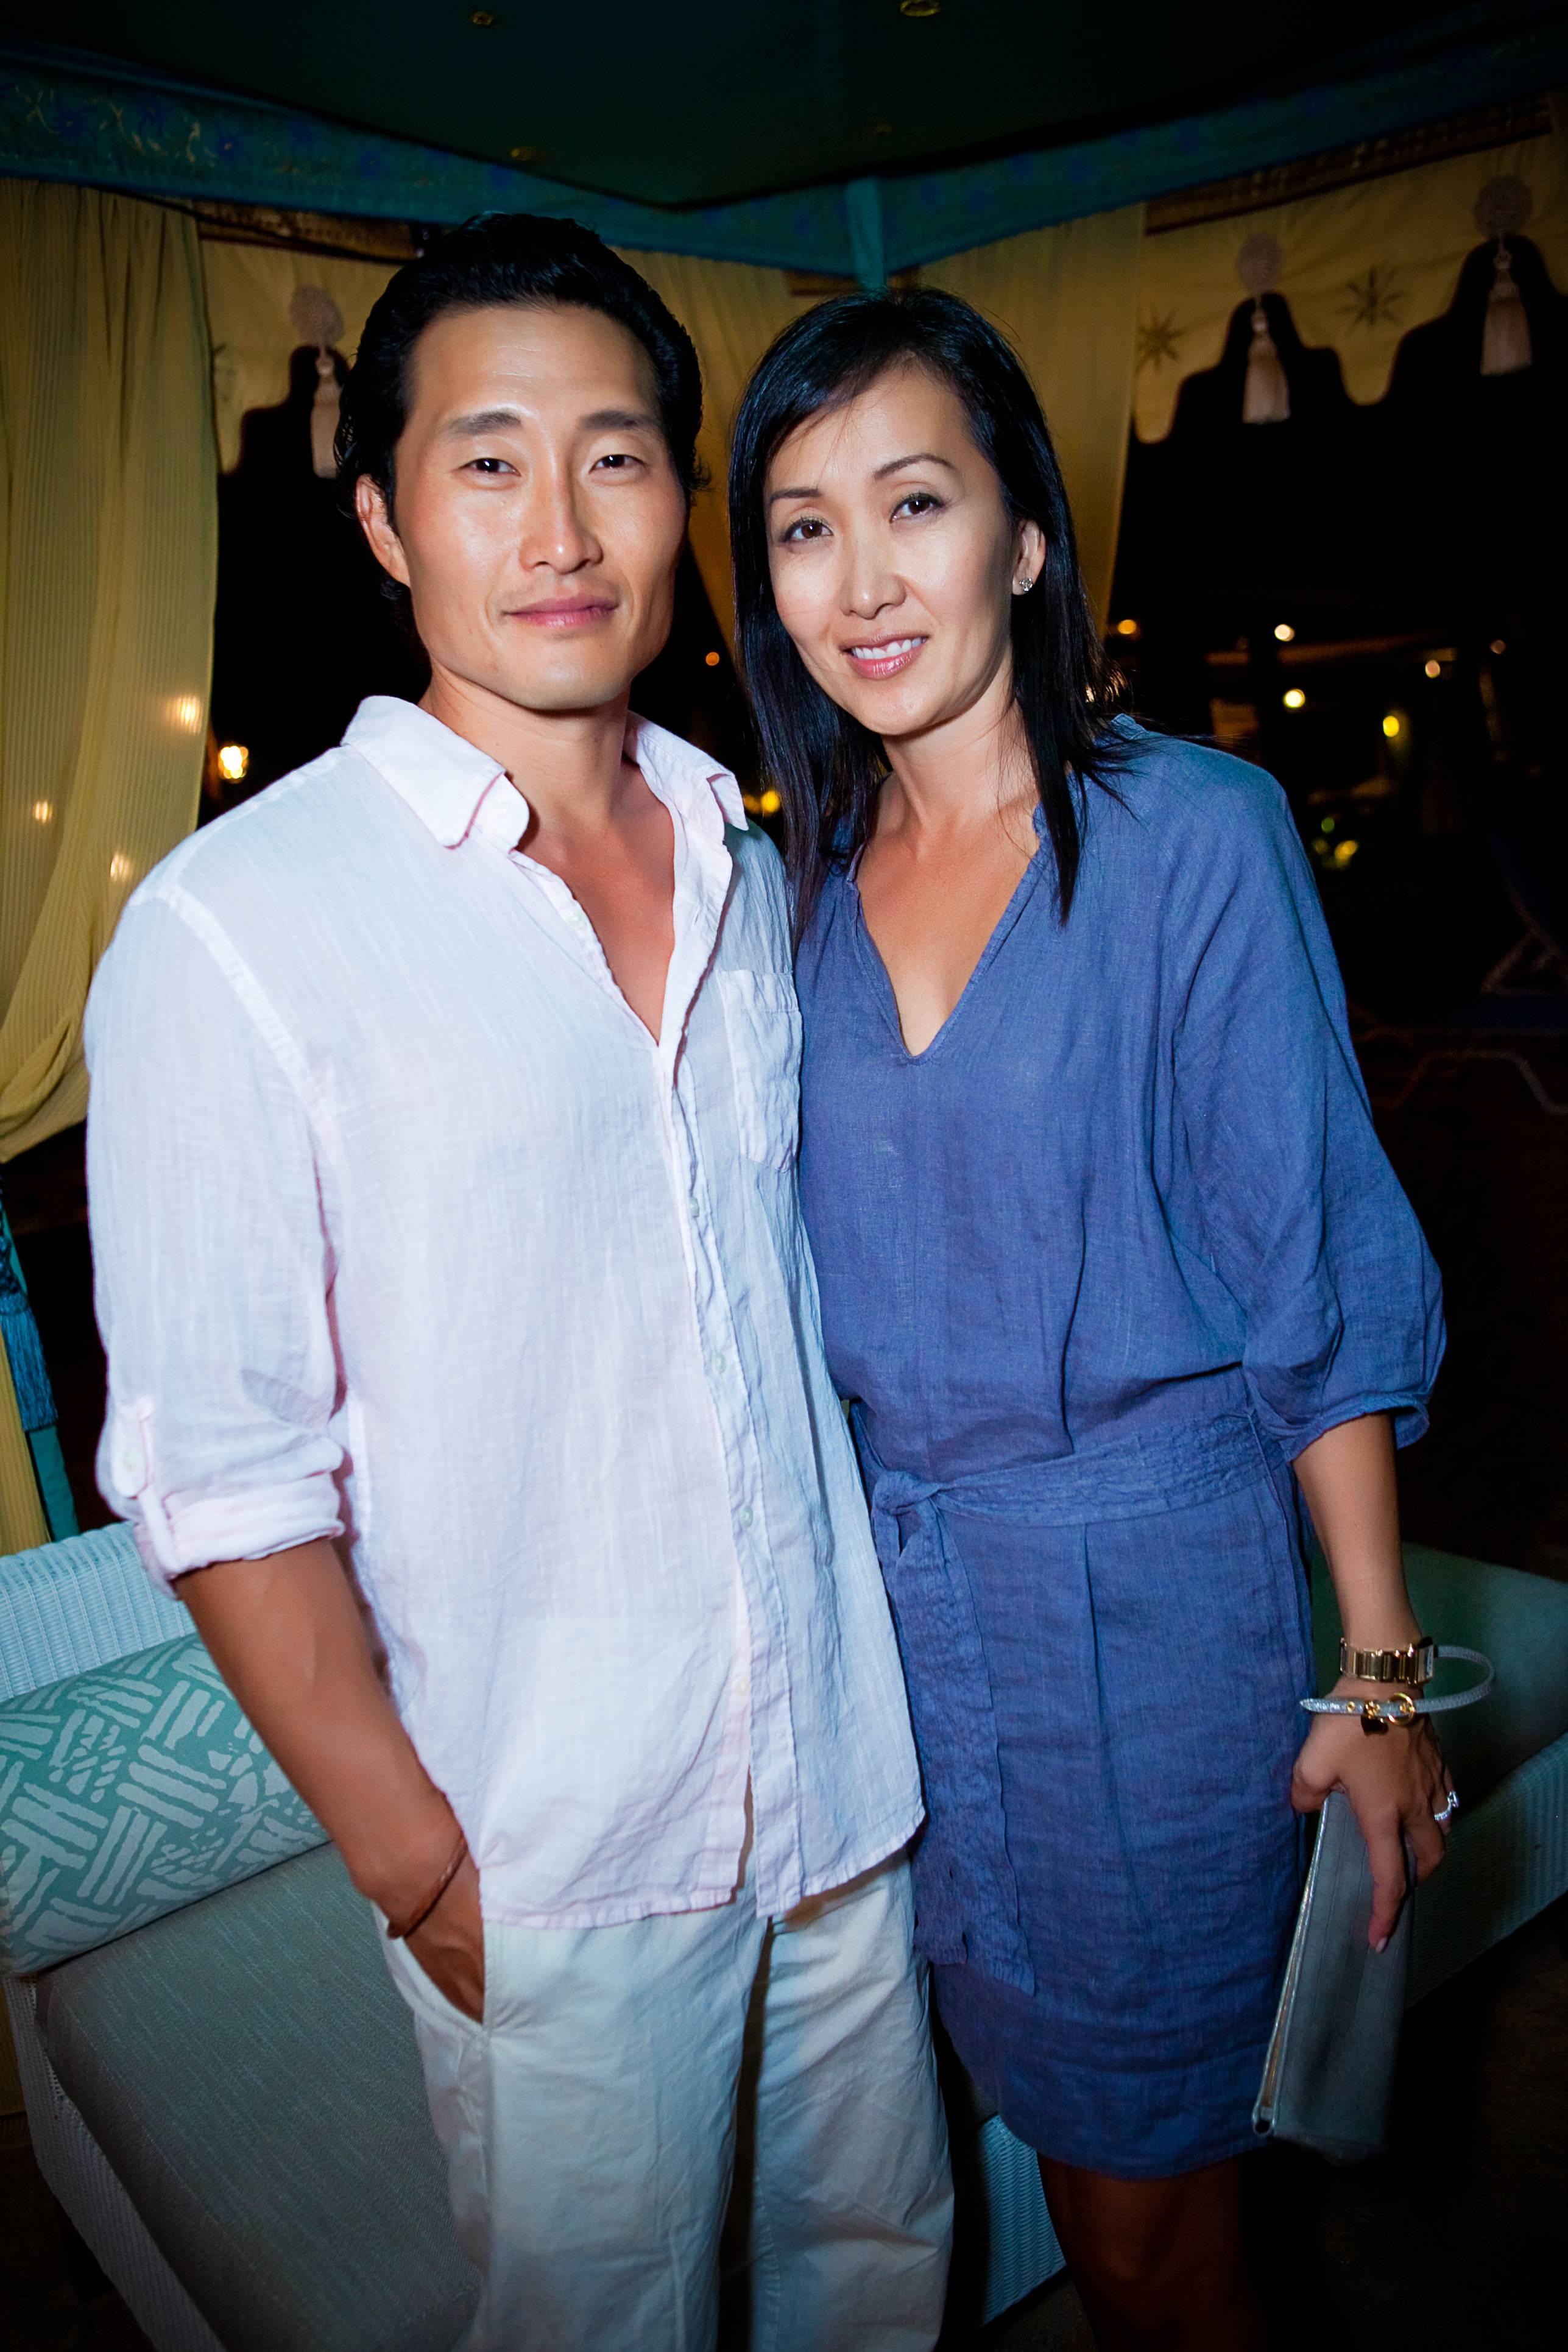 Actor Daniel Dae Kim and wife Mia